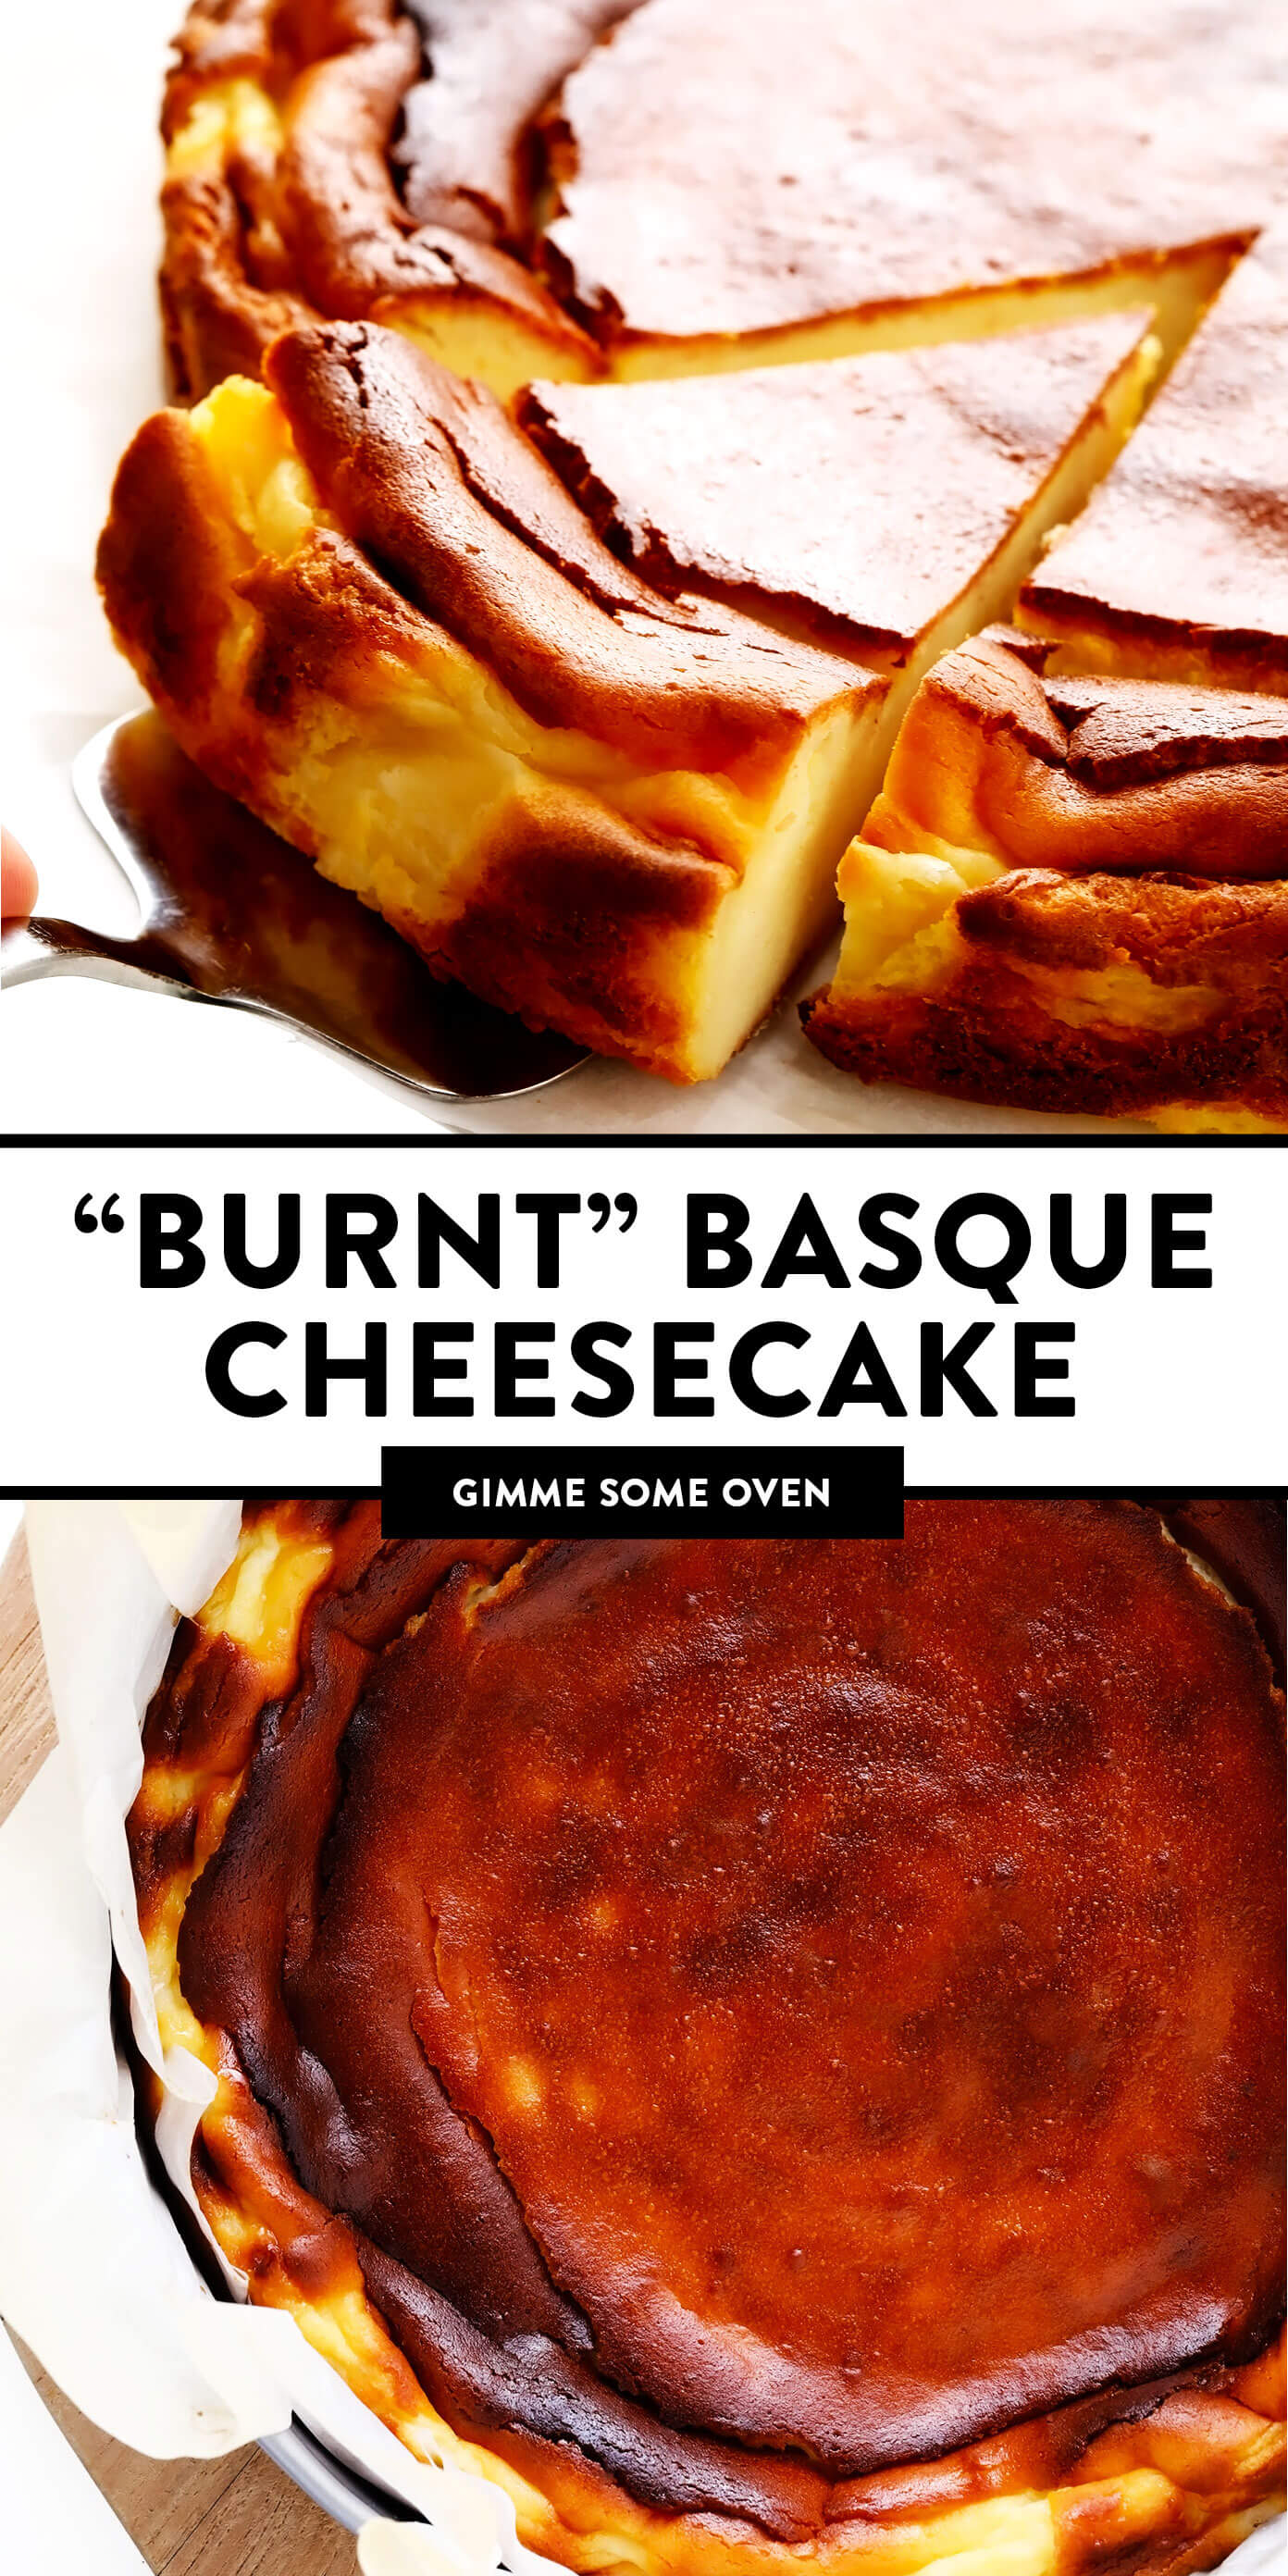 """Burnt"" Basque Cheesecake"